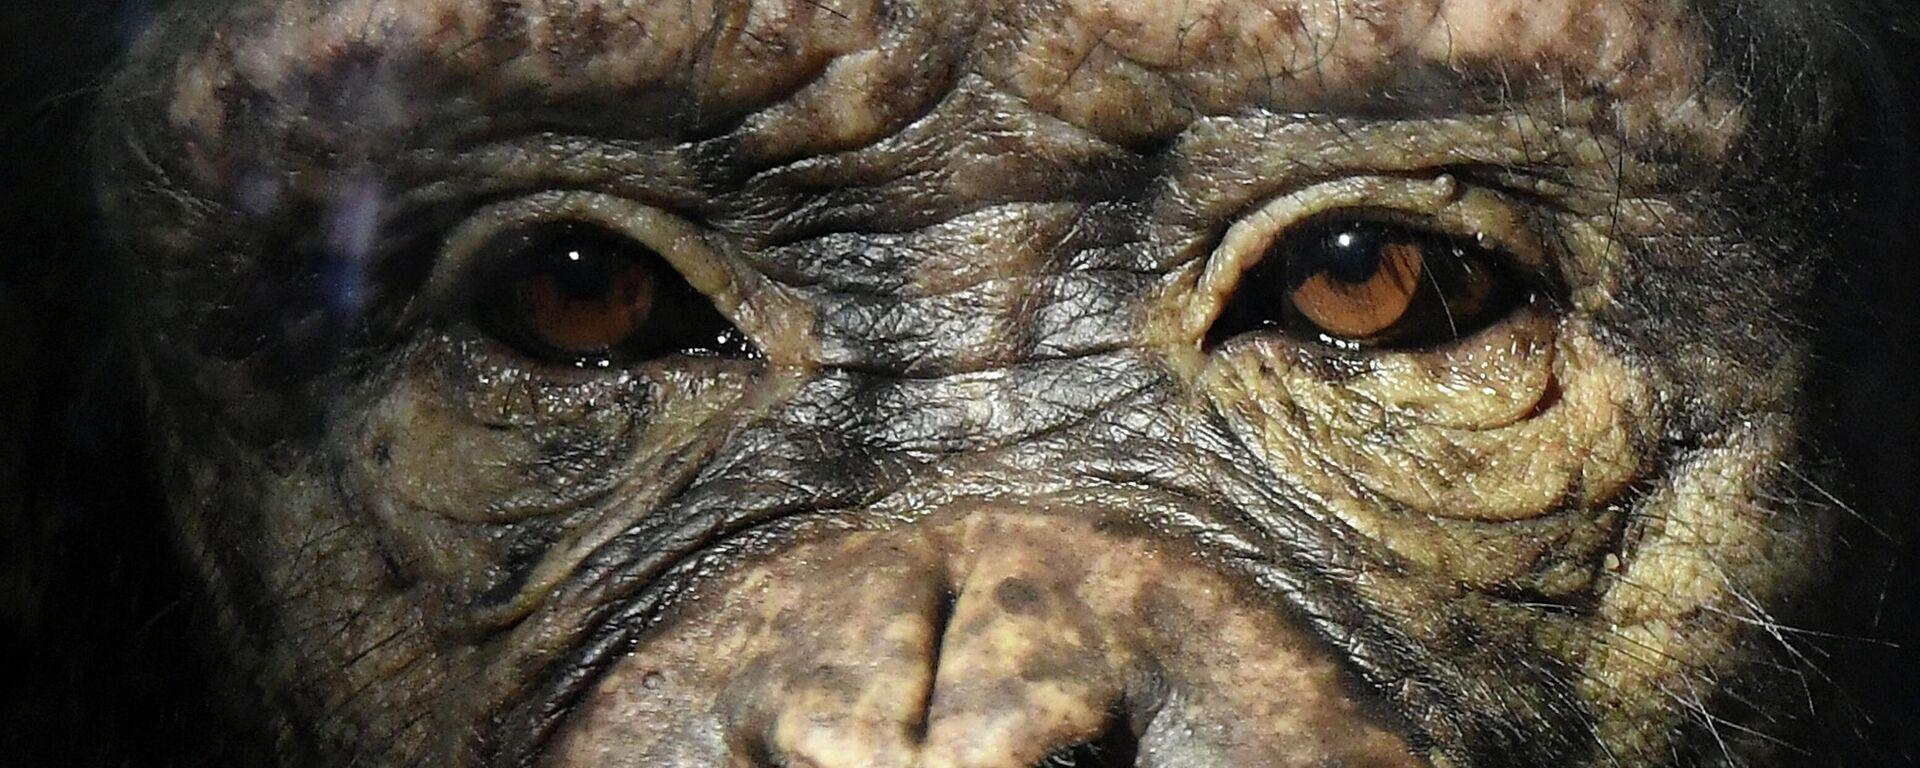 Schimpanse (Symbolbild) - SNA, 1920, 29.01.2021